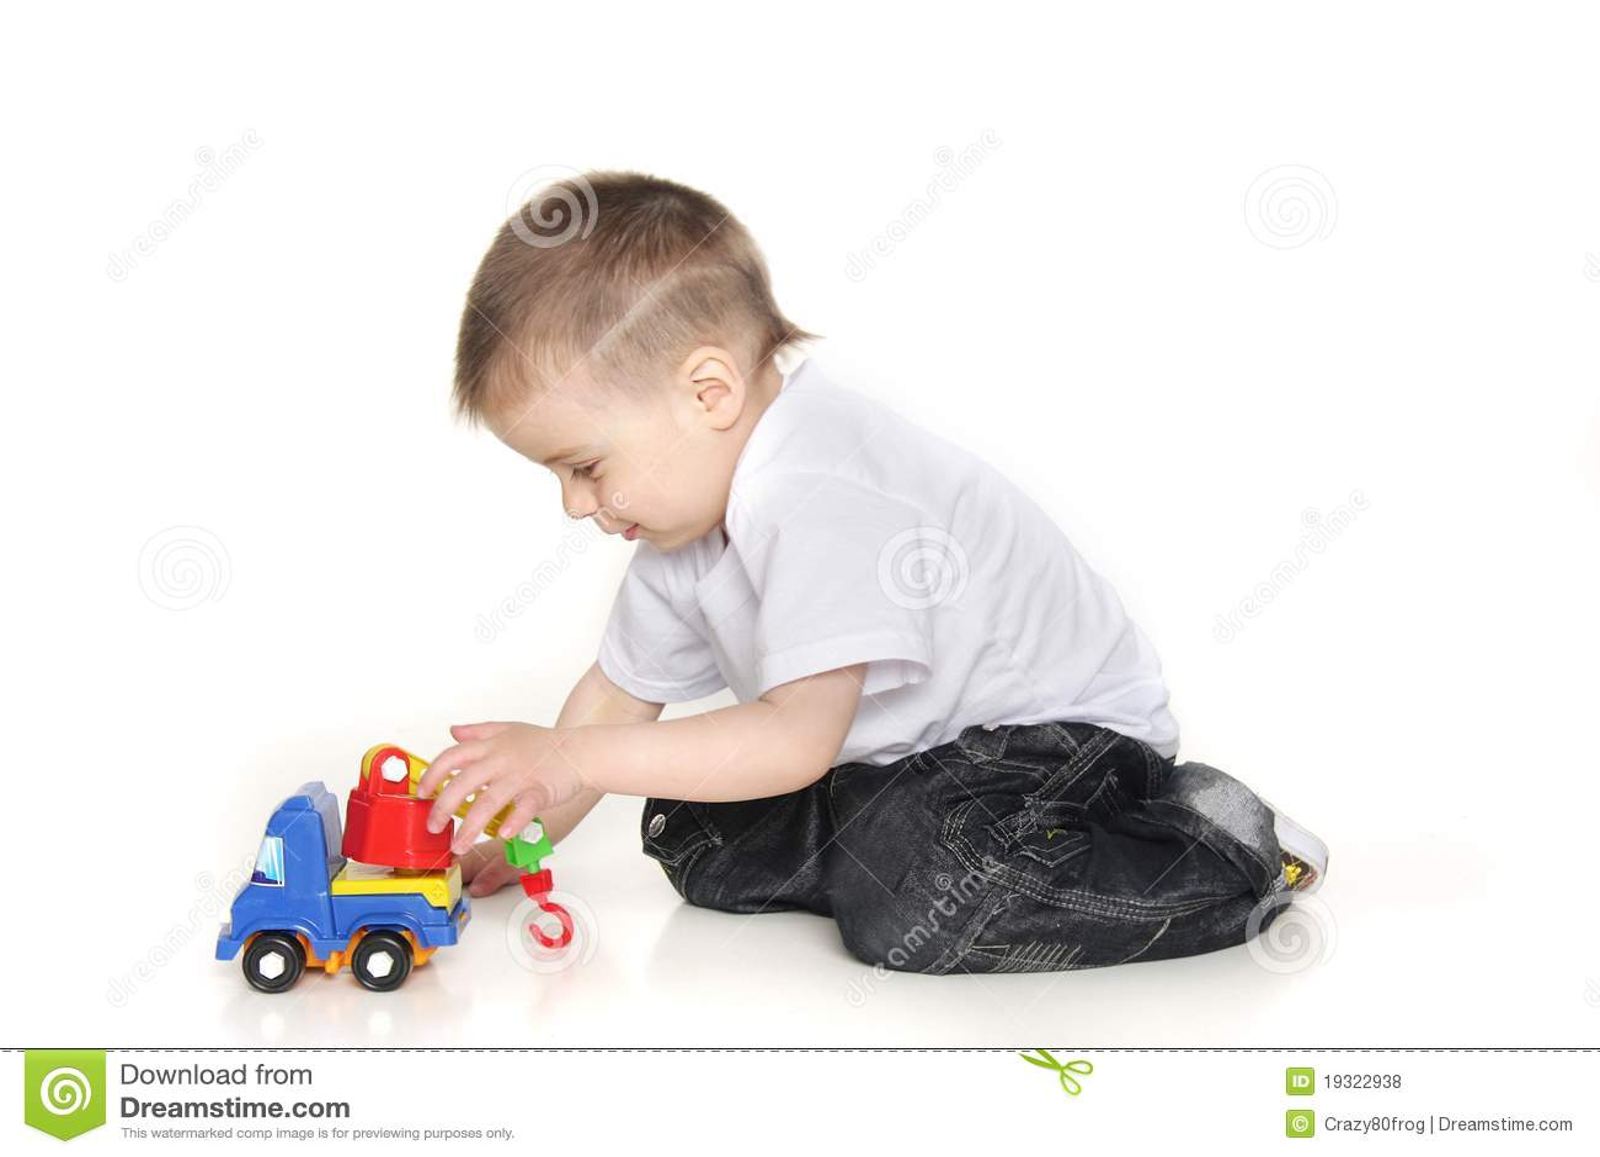 White Boys Toys : Boy playing with toy crane over white royalty free stock